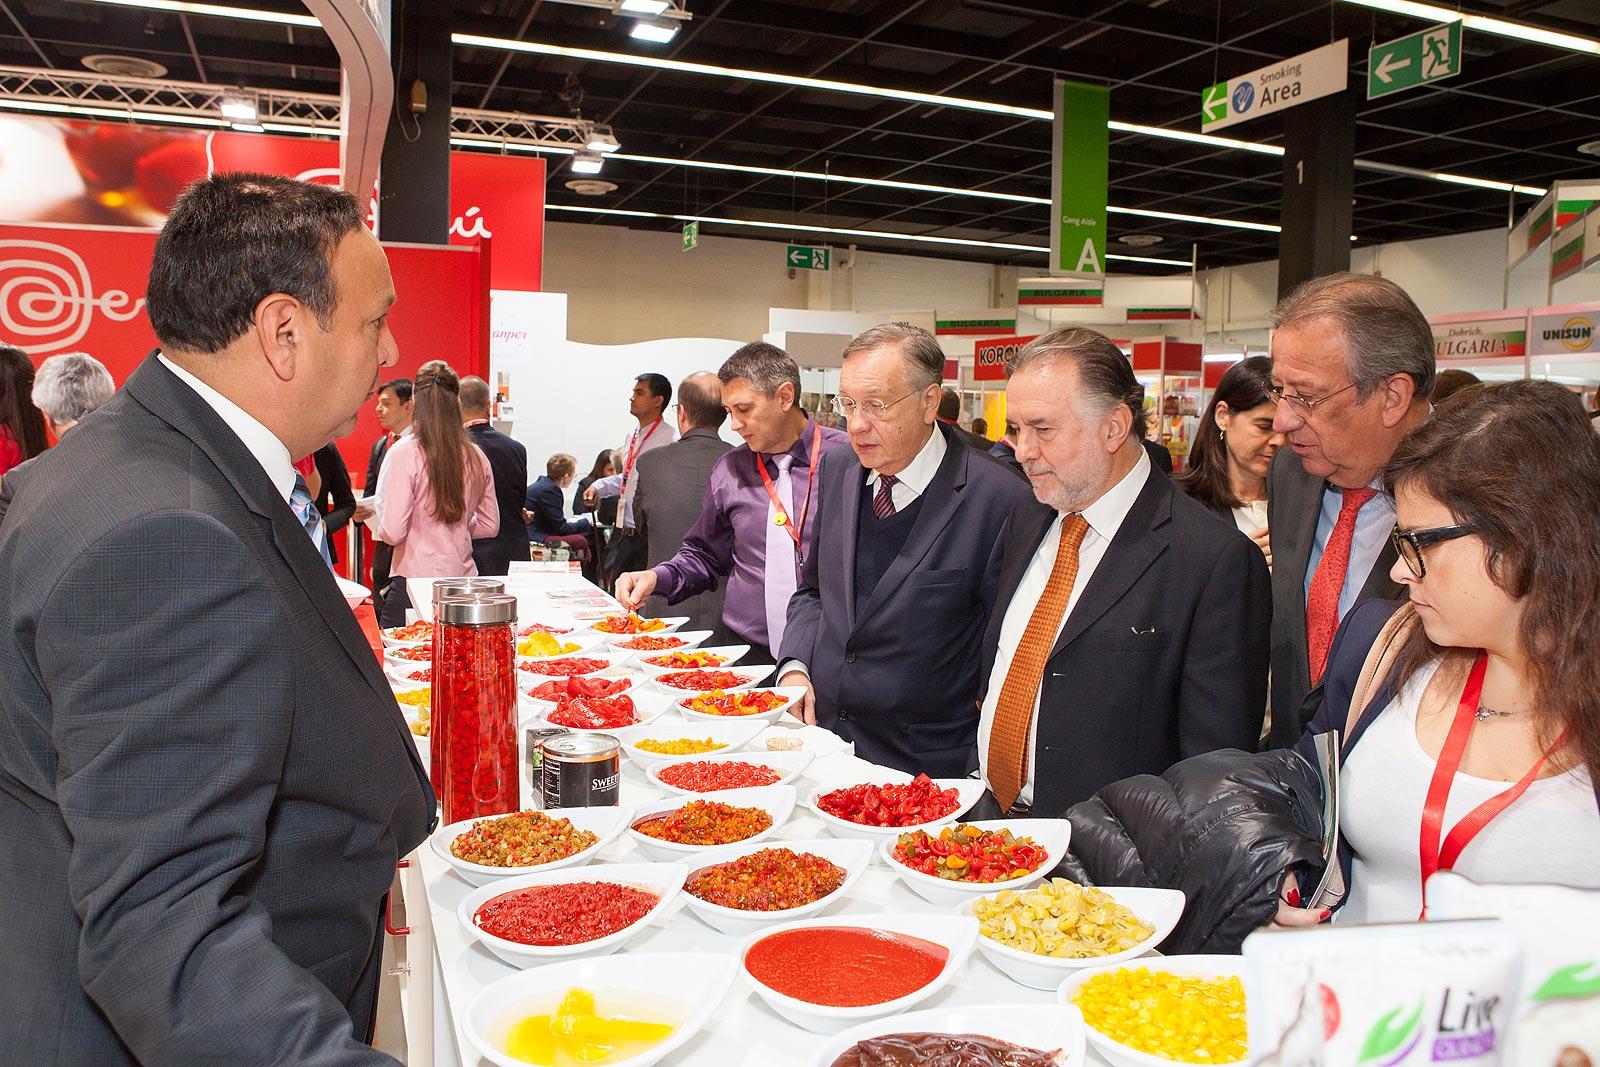 eventfotografie-foods-from-chile-004.jpg